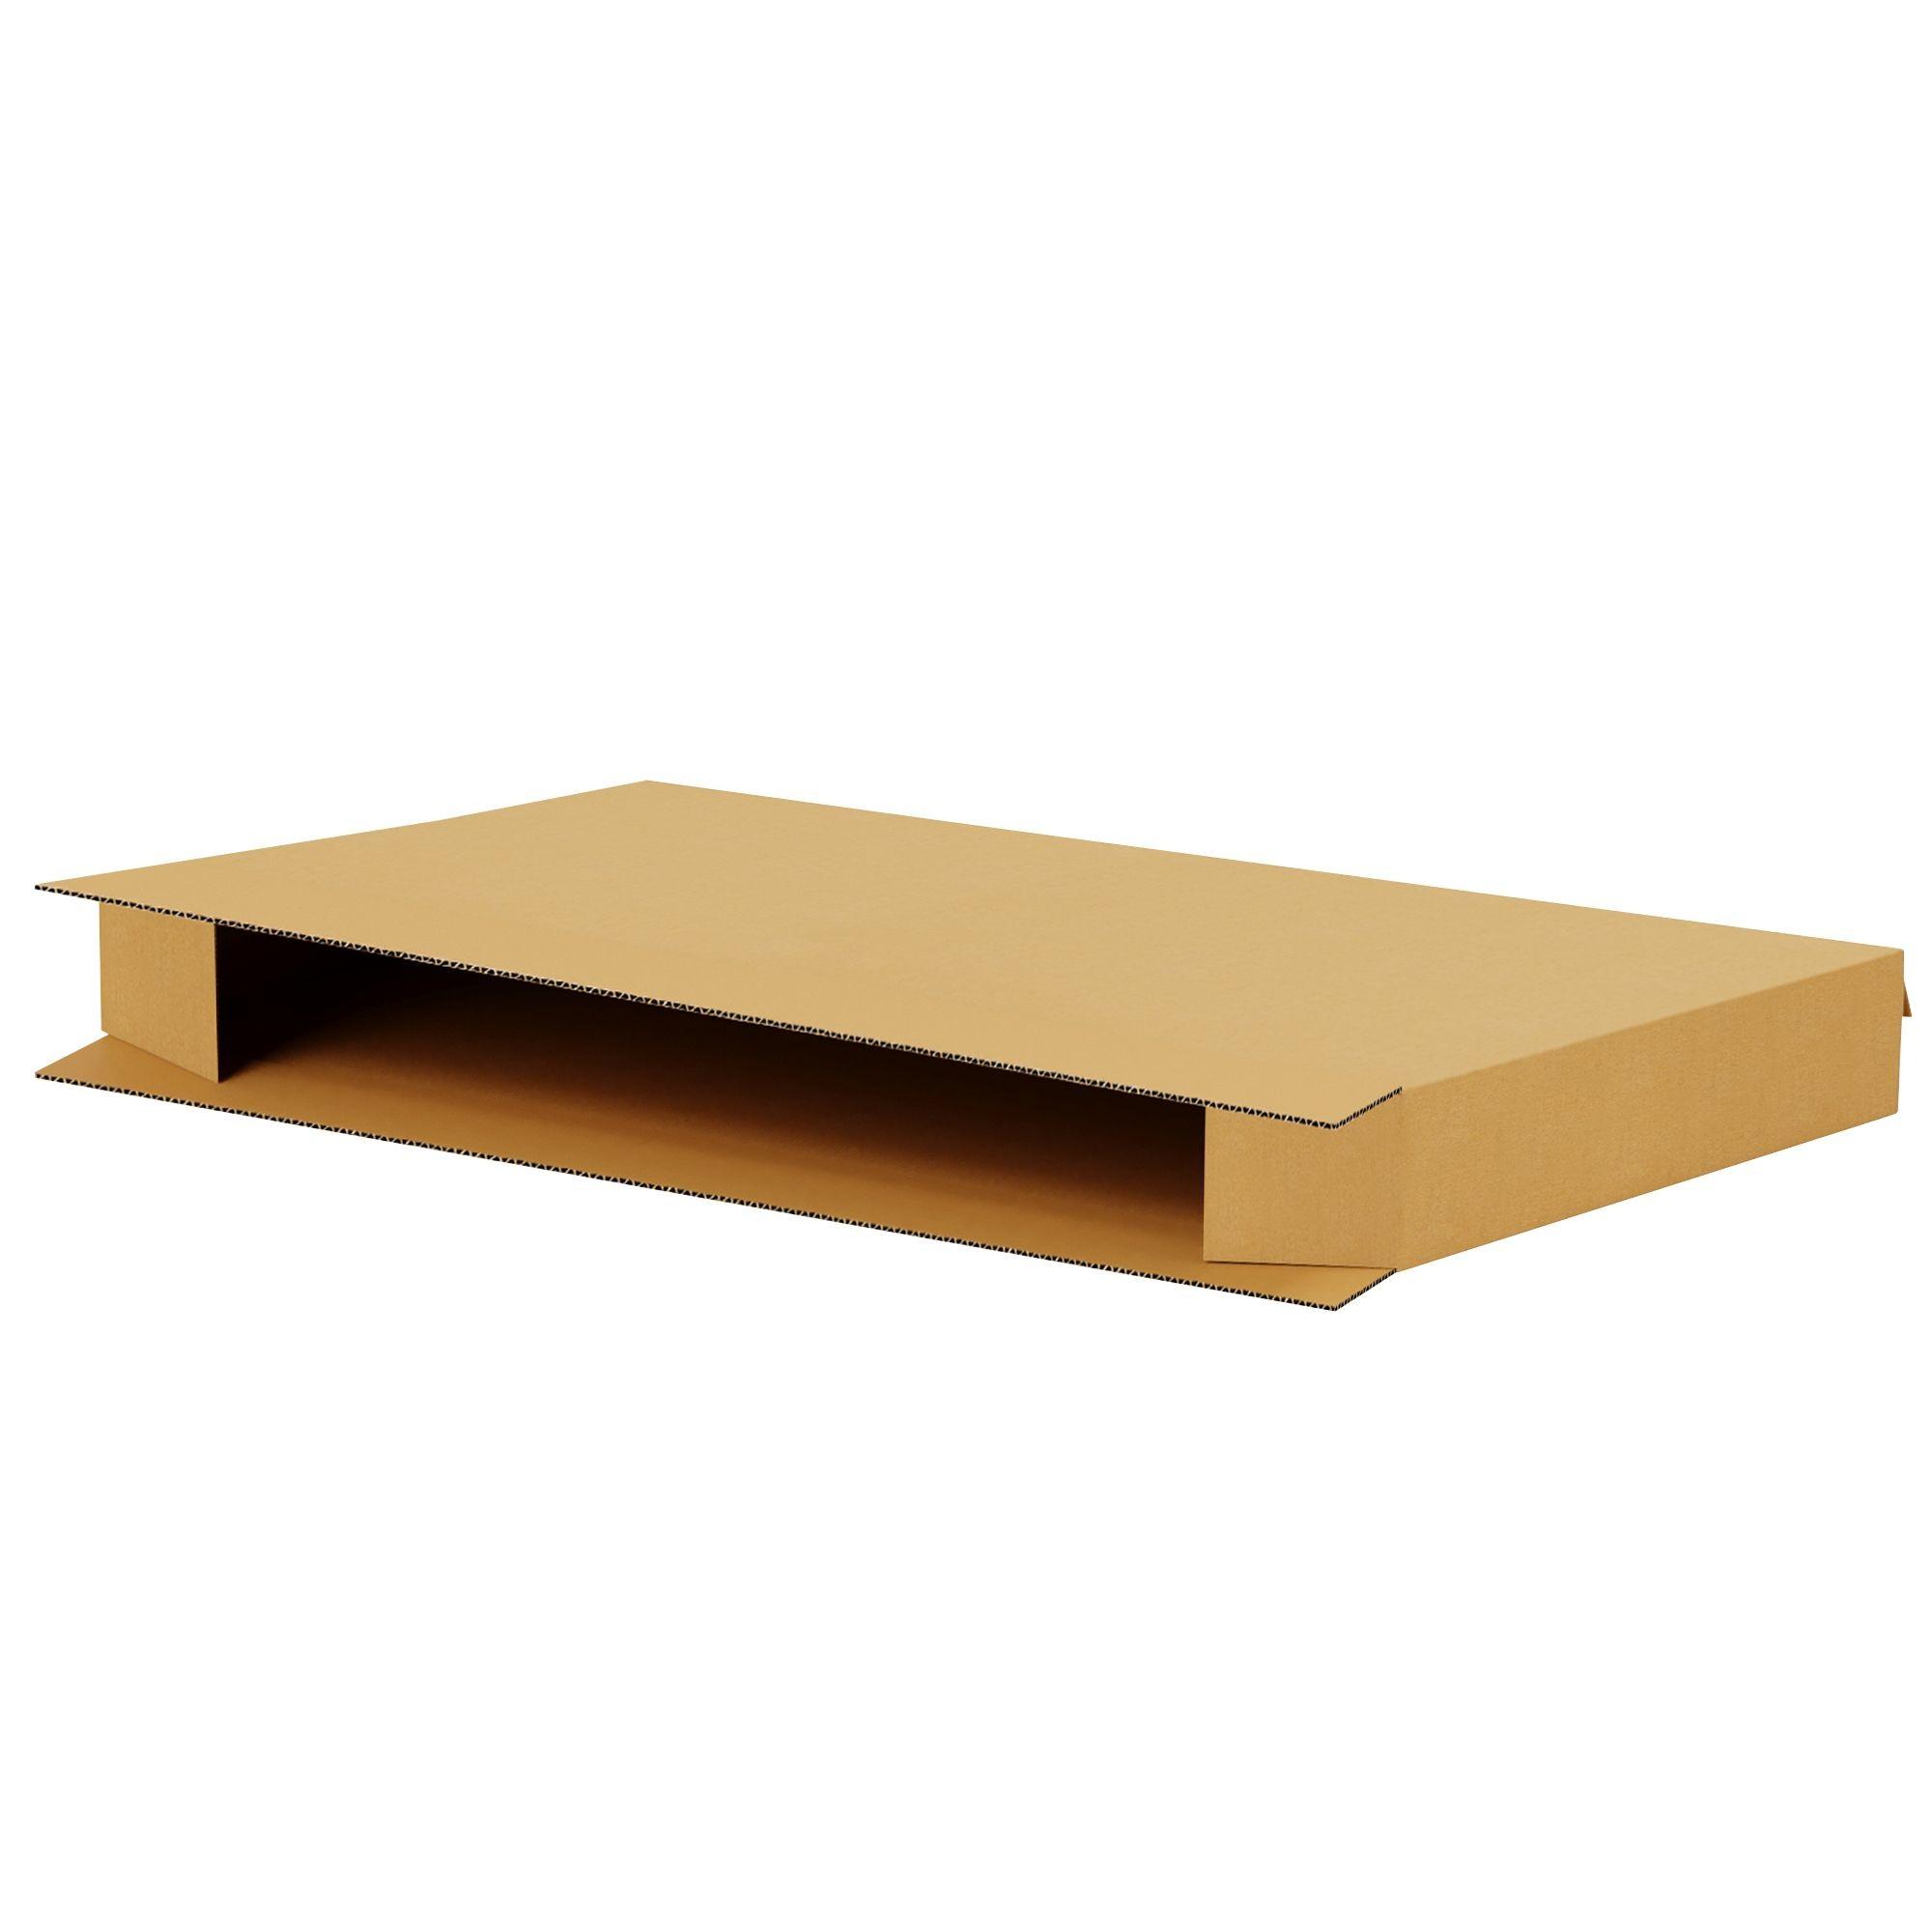 "TOTALPACK® 39 1/2 x 8 1/2 x 75 1/8"" Twin Mattress Corrugated Boxes 1 Unit"